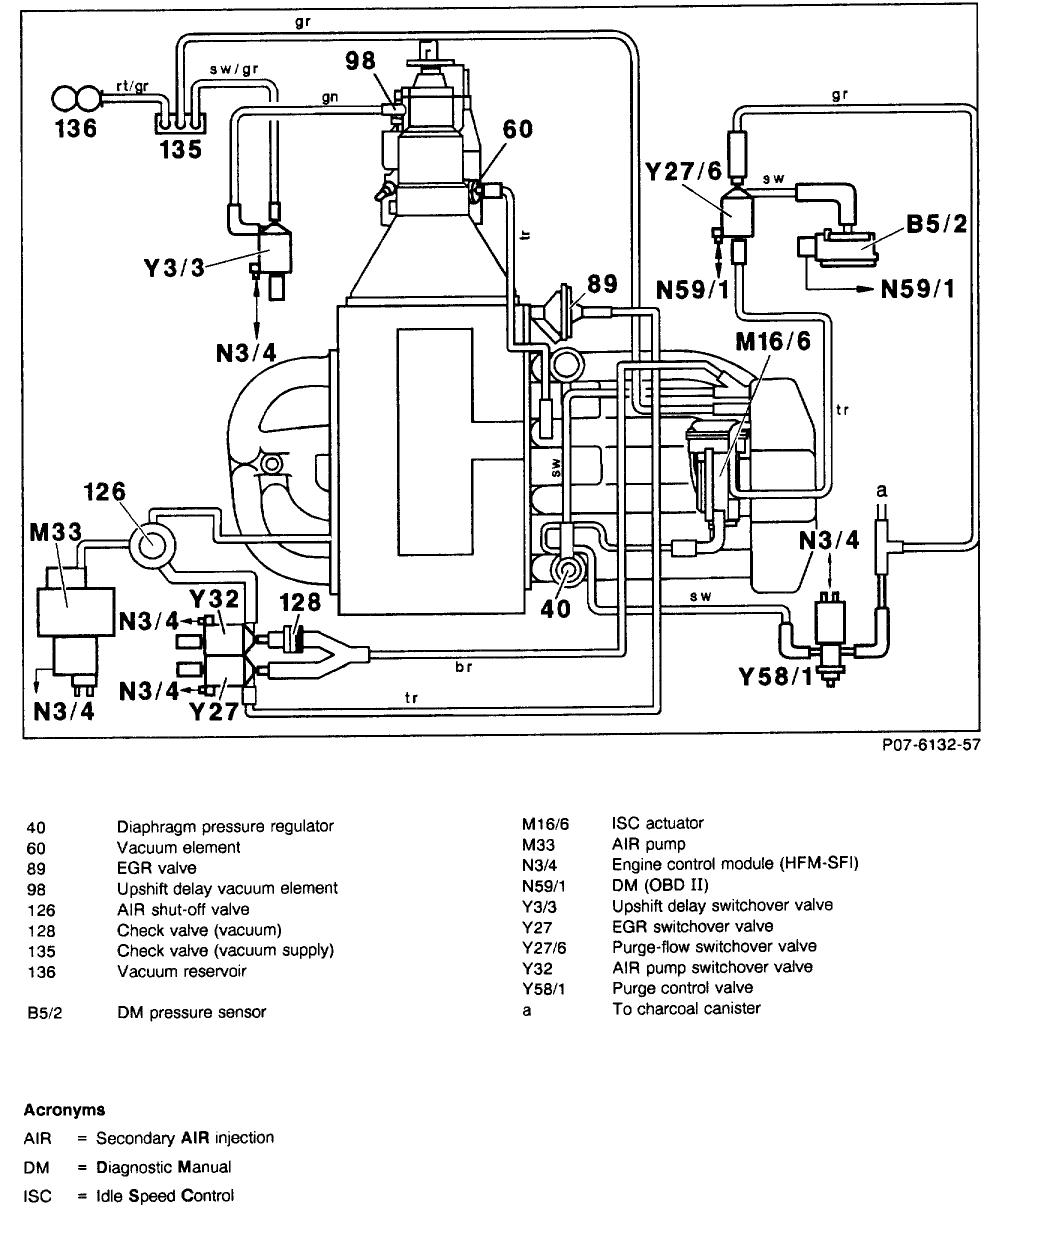 Mercedes Benz Vacuum Diagram 2012 Wildcat 1000 Wiring Diagram Controlwiring Yenpancane Jeanjaures37 Fr